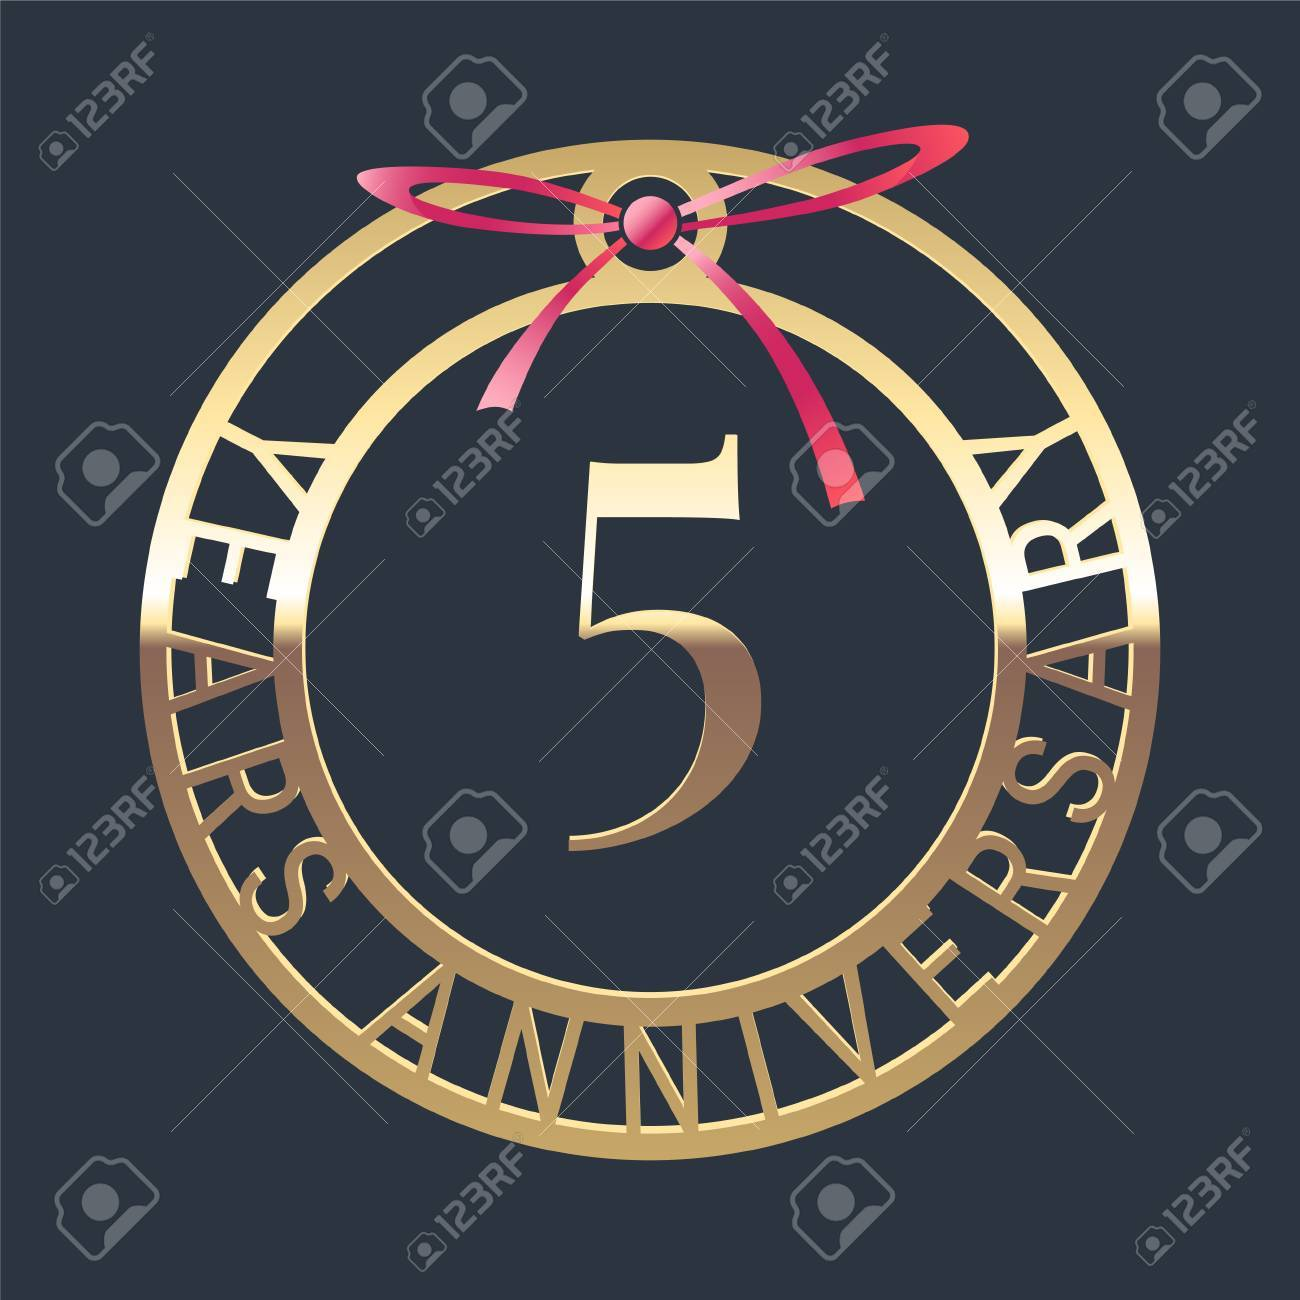 5 years anniversary vector icon symbol graphic design element 5 years anniversary vector icon symbol graphic design element or logo with golden medal biocorpaavc Choice Image